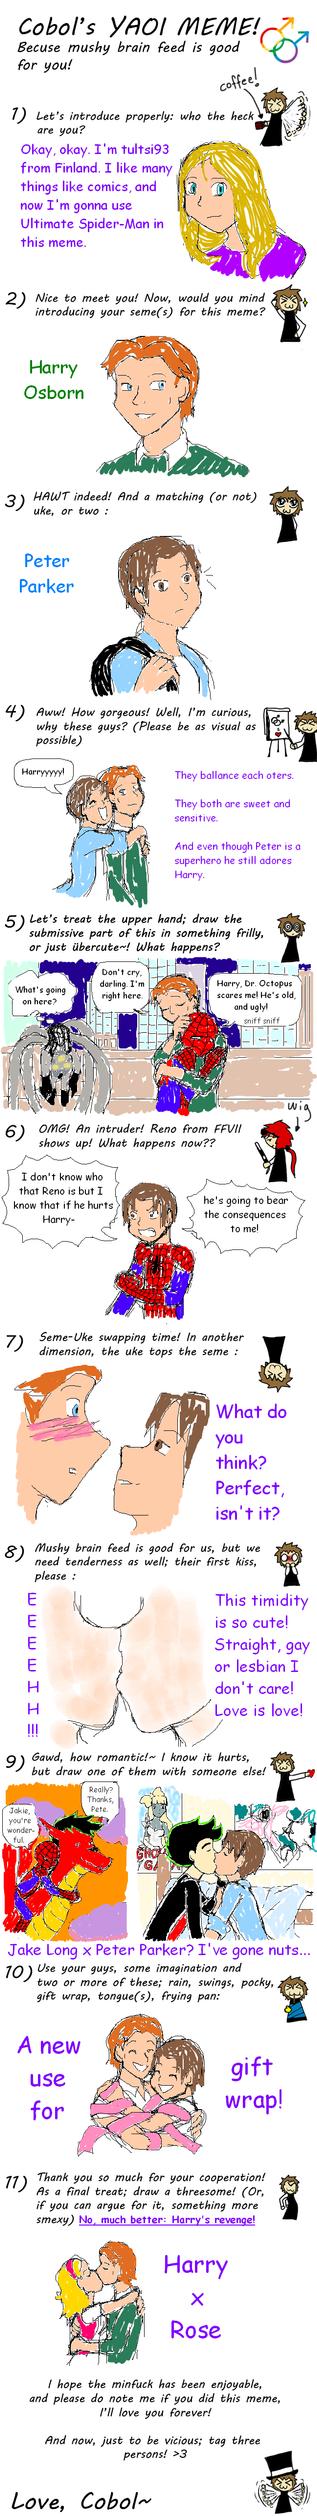 Cobol's yaoi meme: Marvel and Disney by tultsi93